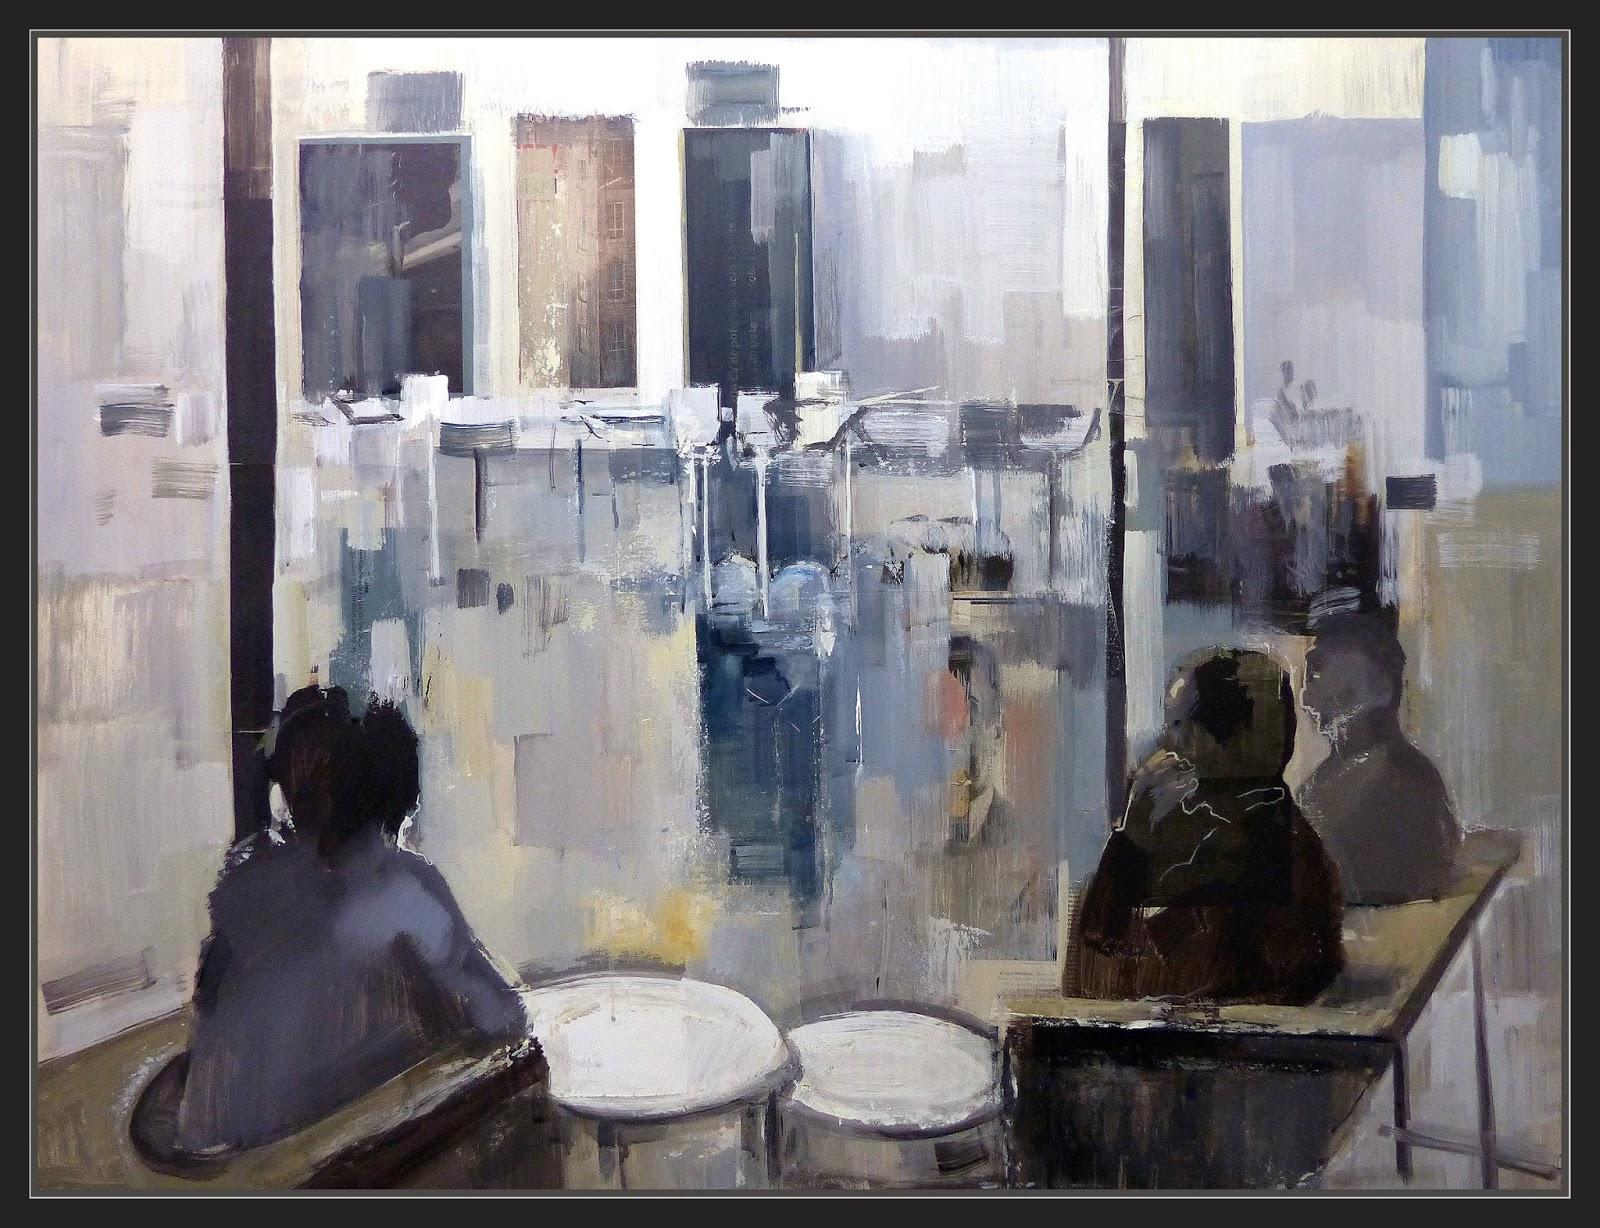 Ernest descals artista pintor cafeterias pintura - Cuadros de interiores ...